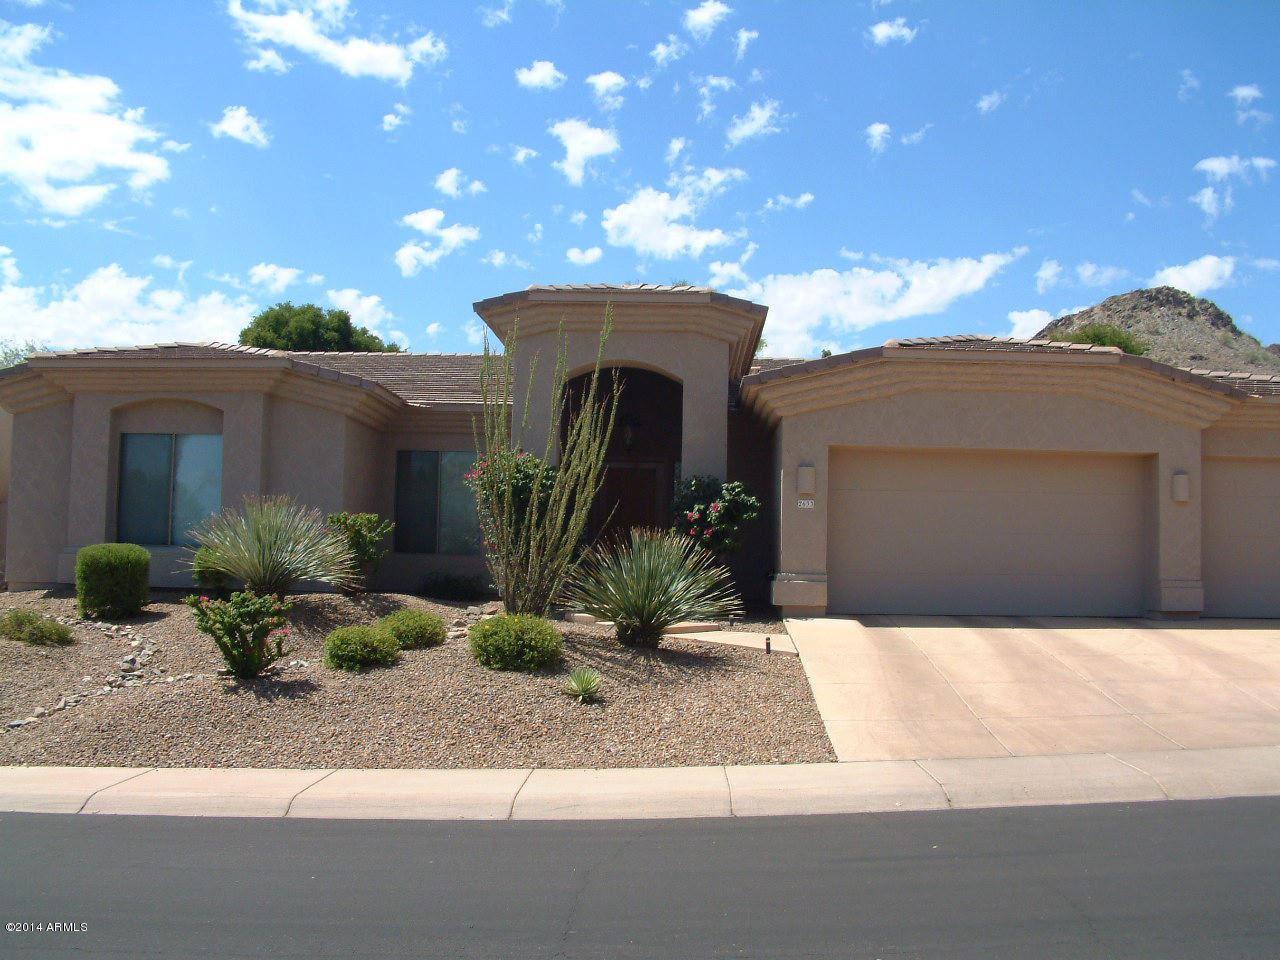 2633 E ACOMA Drive, Phoenix, AZ 85032 - #: 6092286